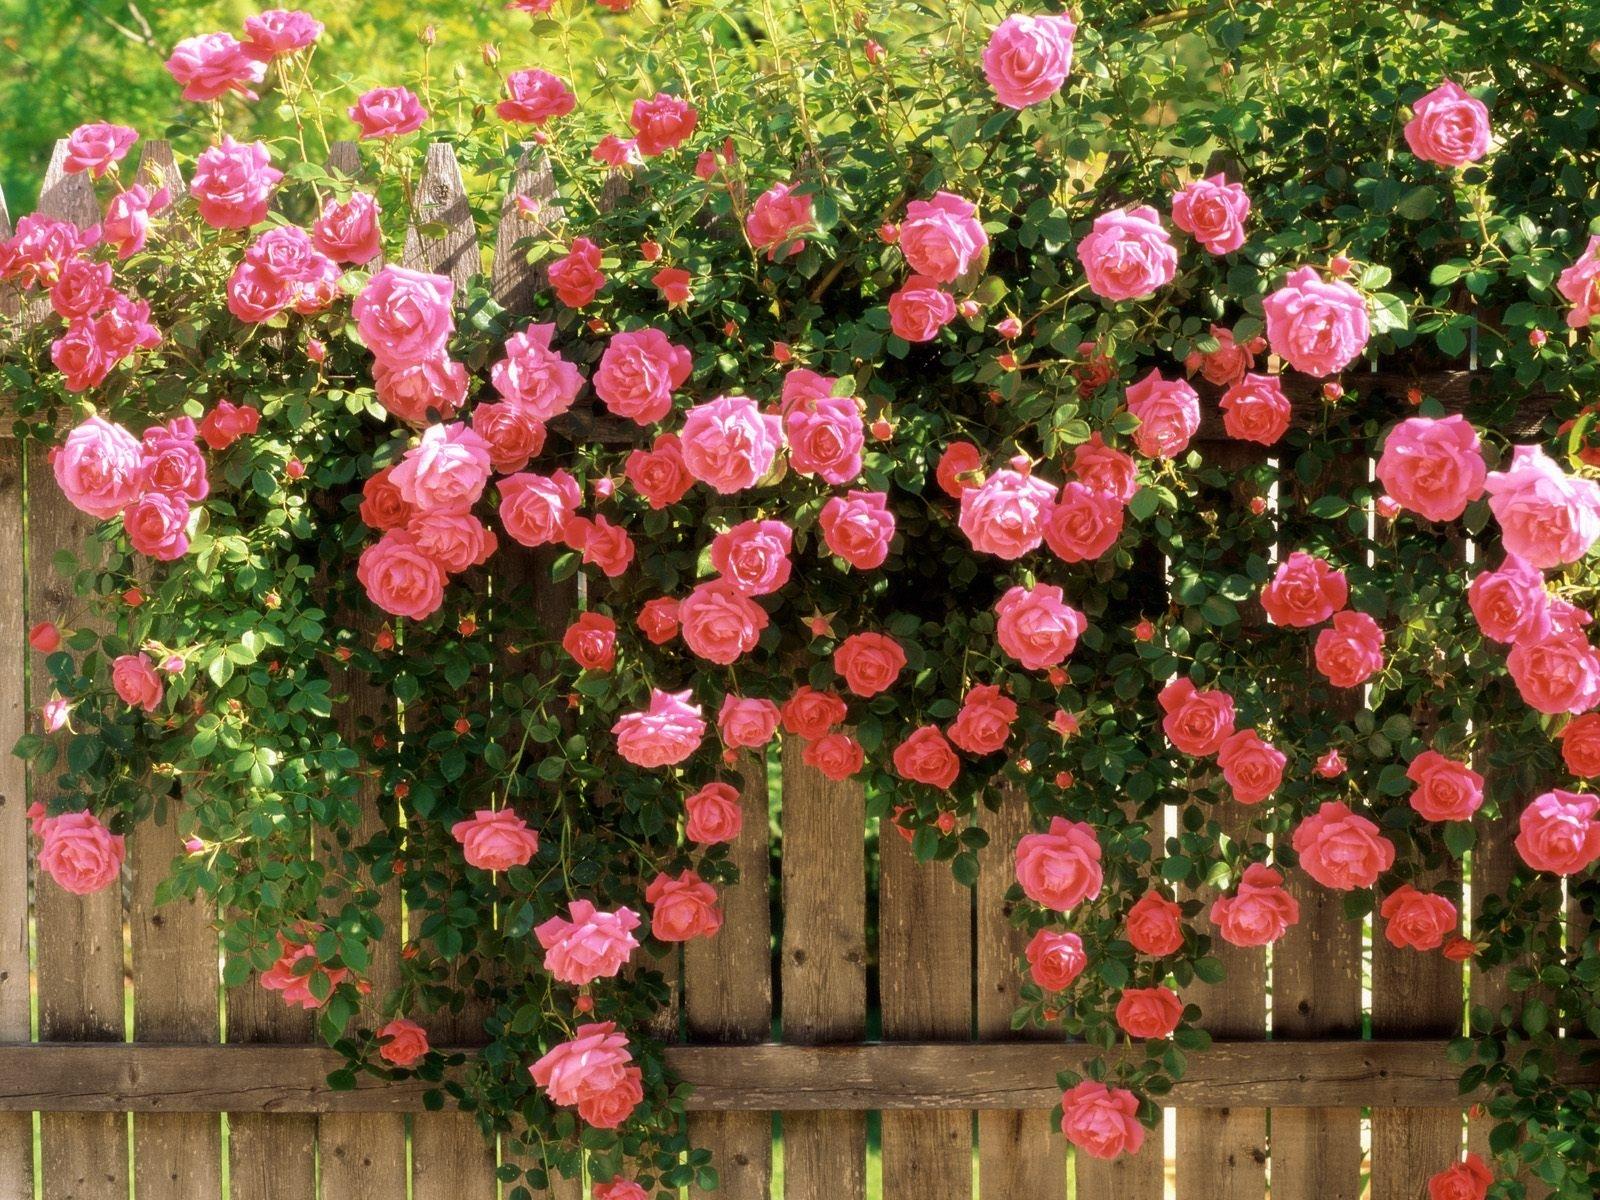 Roses Wallpapers I HD Roses Wallpaper I Best Roses Wallpaper I 1600x1200